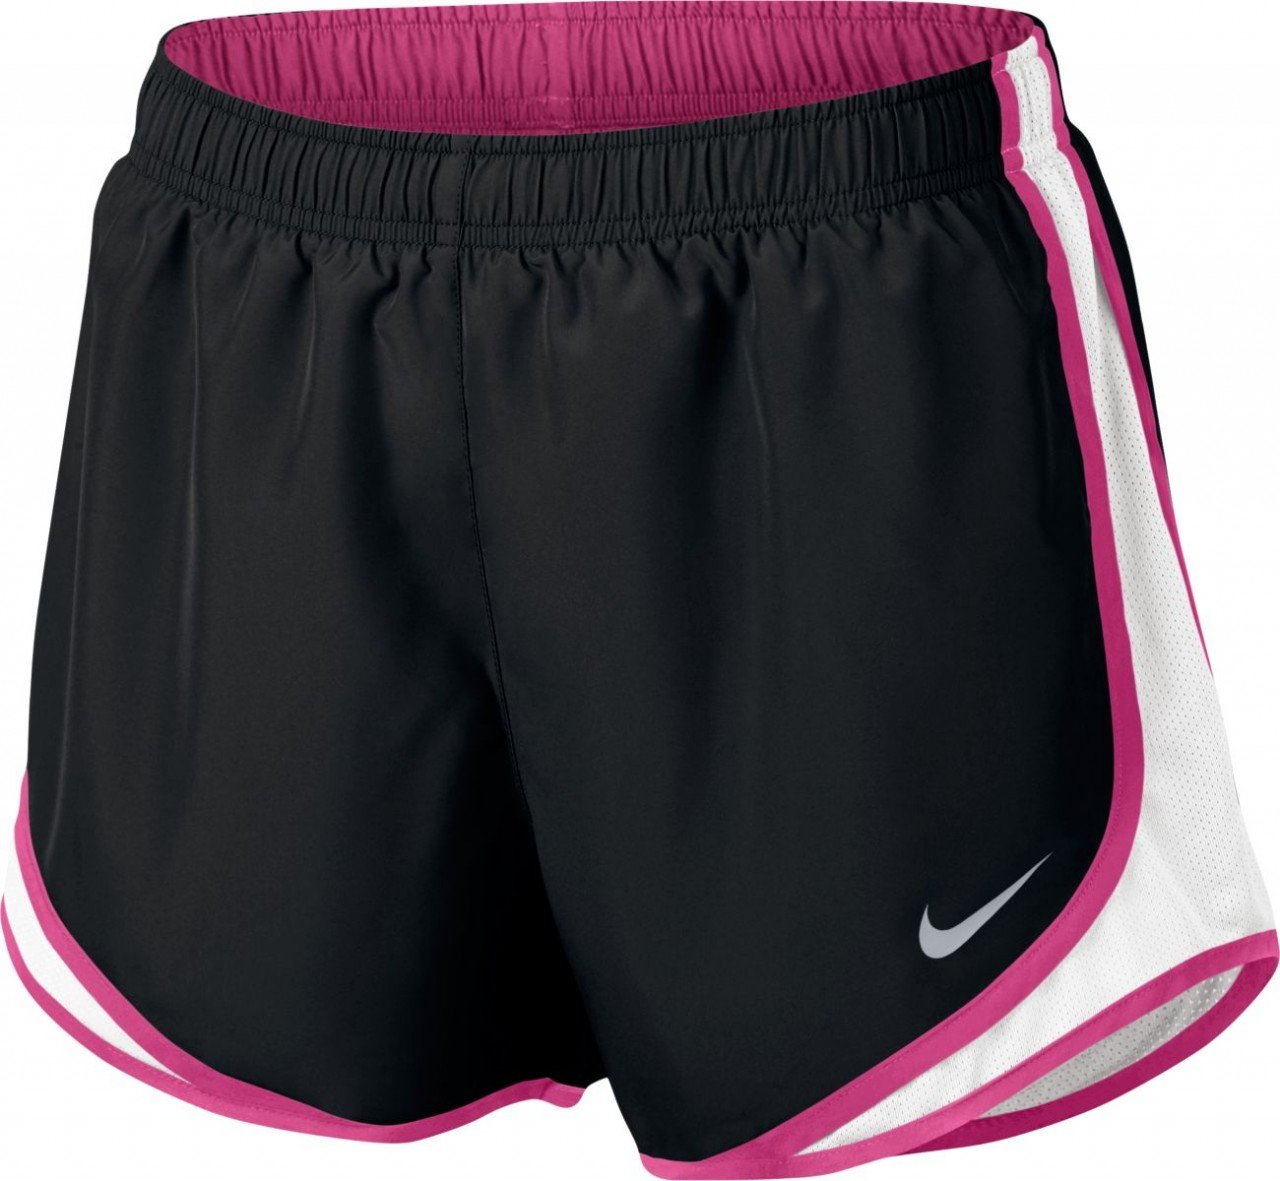 Nike Women's Dry Tempo Short, Black/White/Vivid Pink, Small by Nike